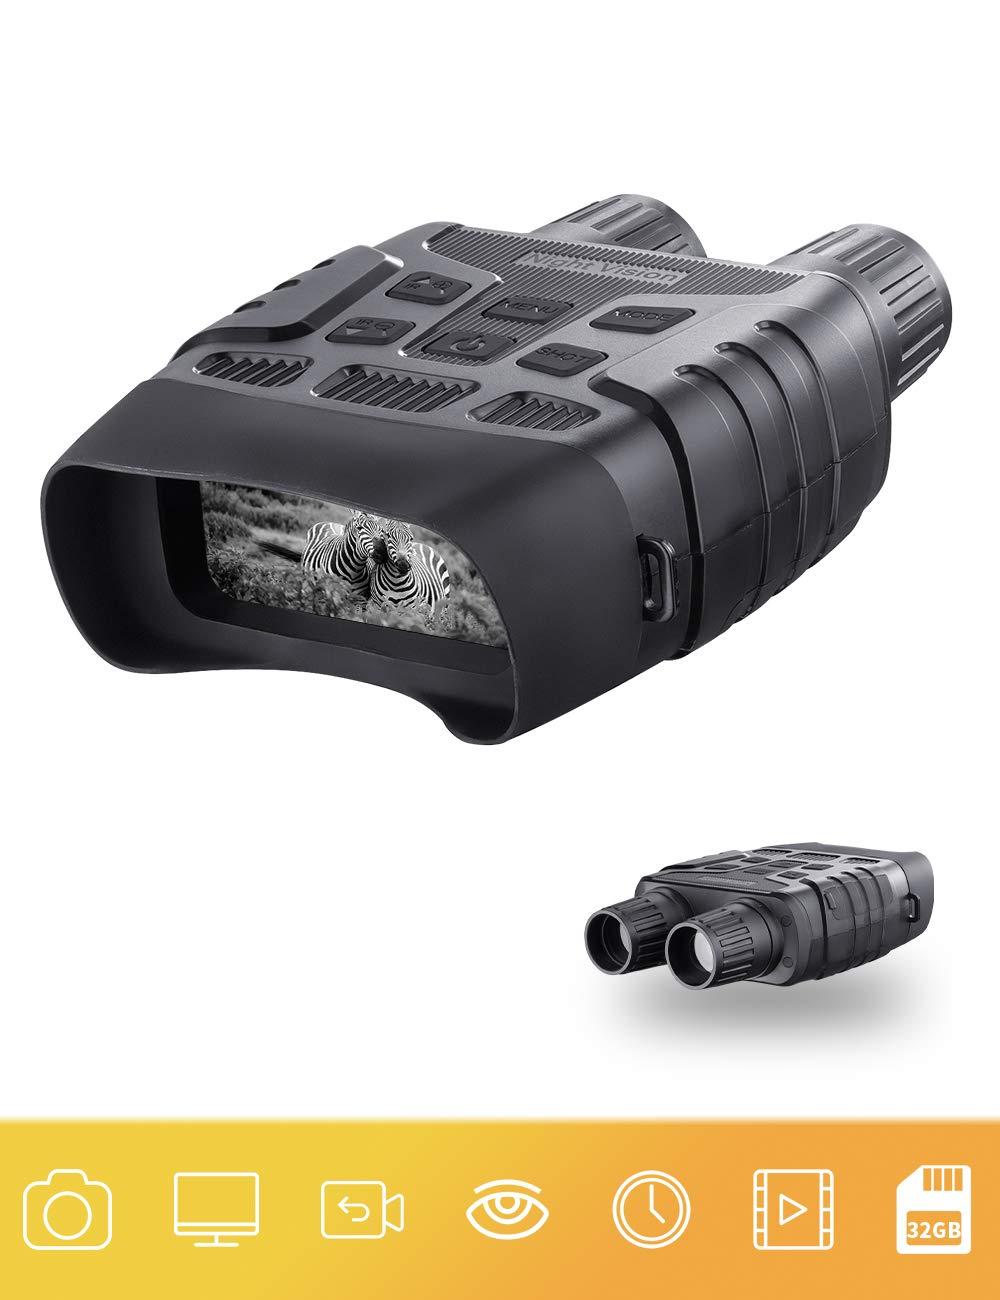 "Digital Night Vision Binoculars 7x31mm 2.31"" TFT LCD Screen with 32GB TF Card Infrared IR Camera Photos Videos Recorder in Full Dark"